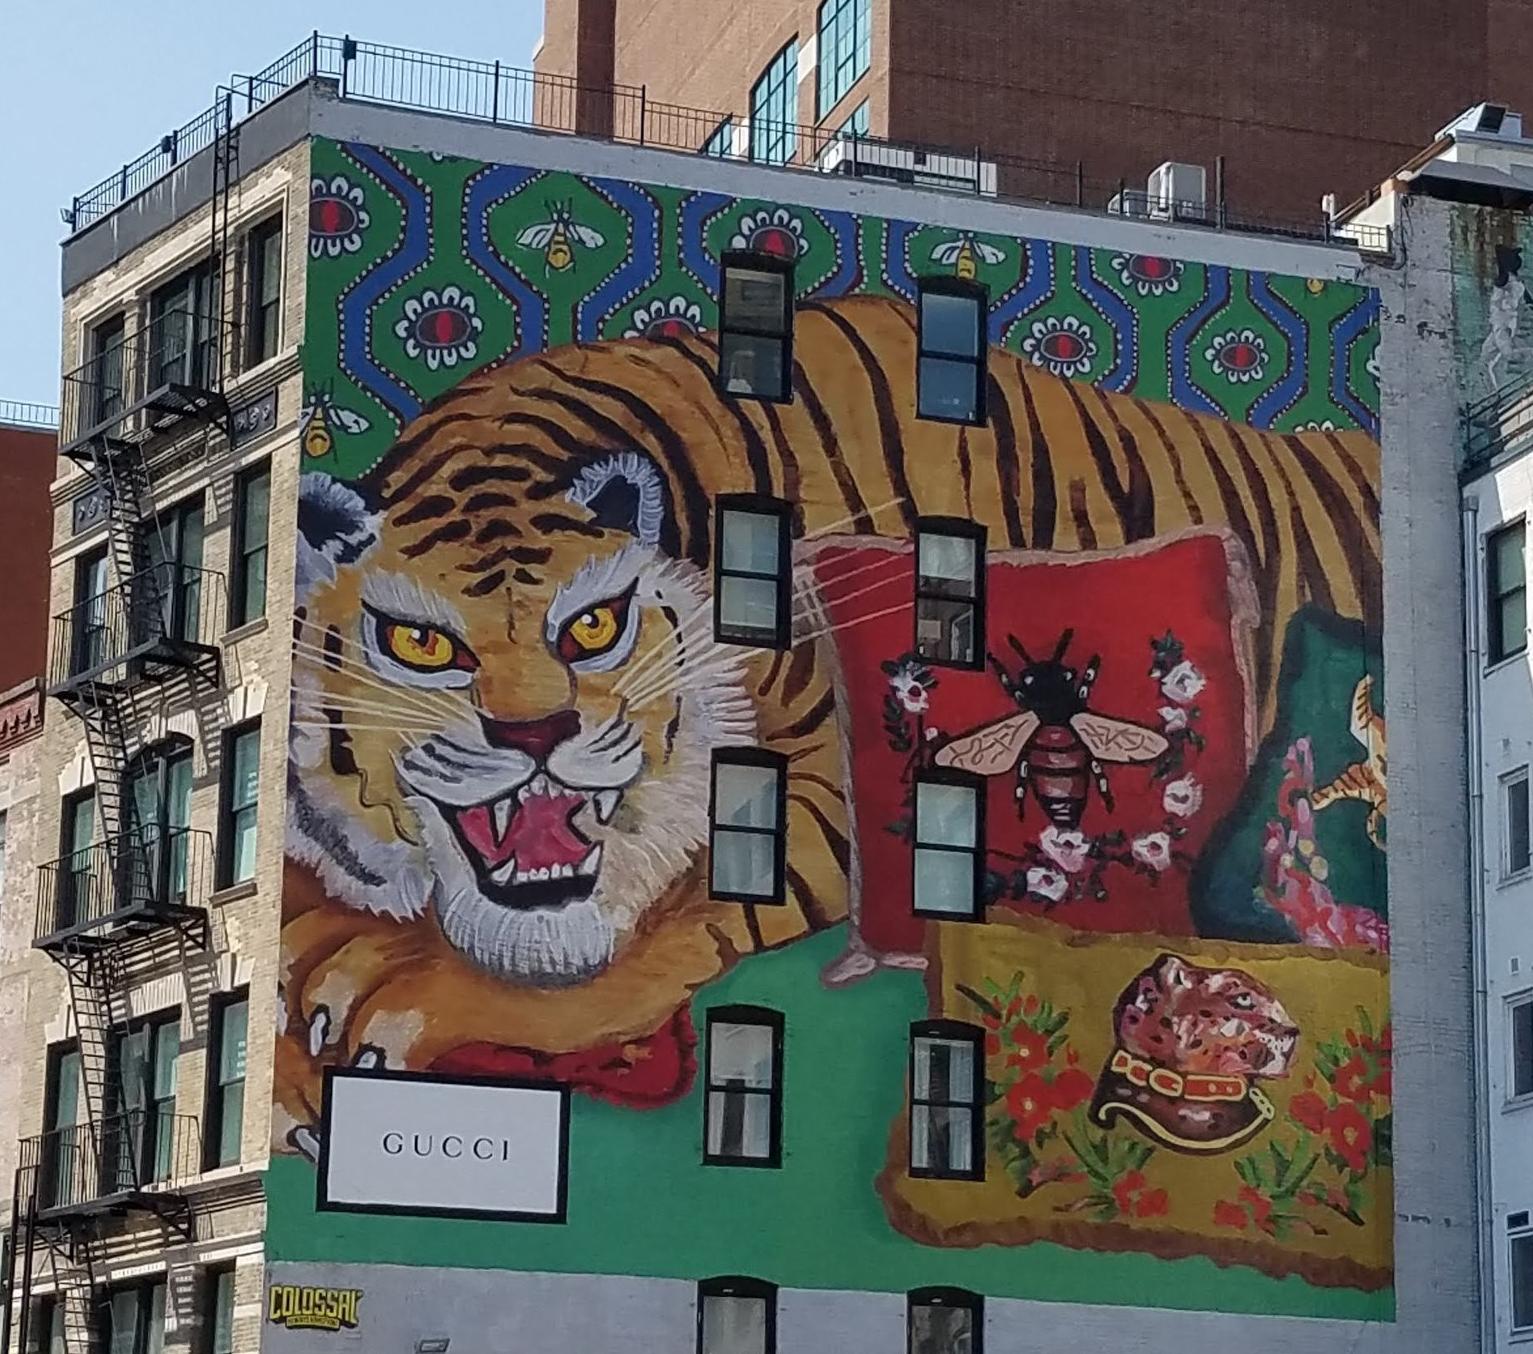 Mural in Soho, New York.